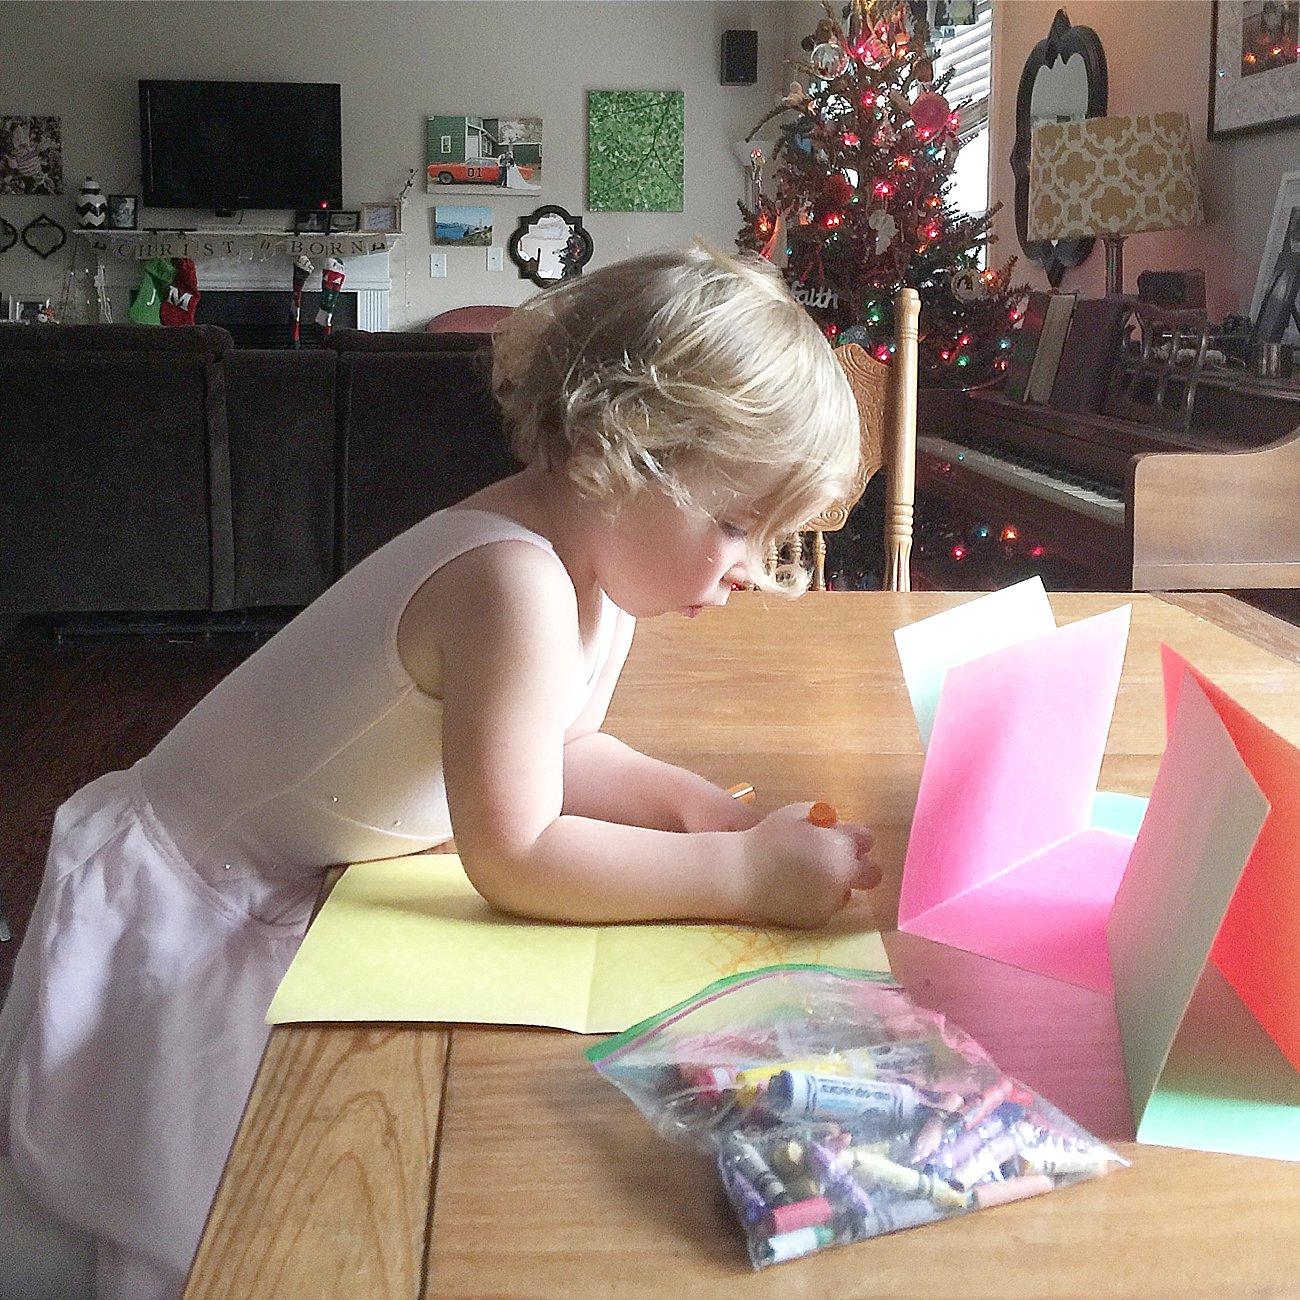 25 Random Acts of Christmas Kindness - Kindness Advent 2016 | Recap #trikind25 #kindnessadvent #25daysofkindness (5)